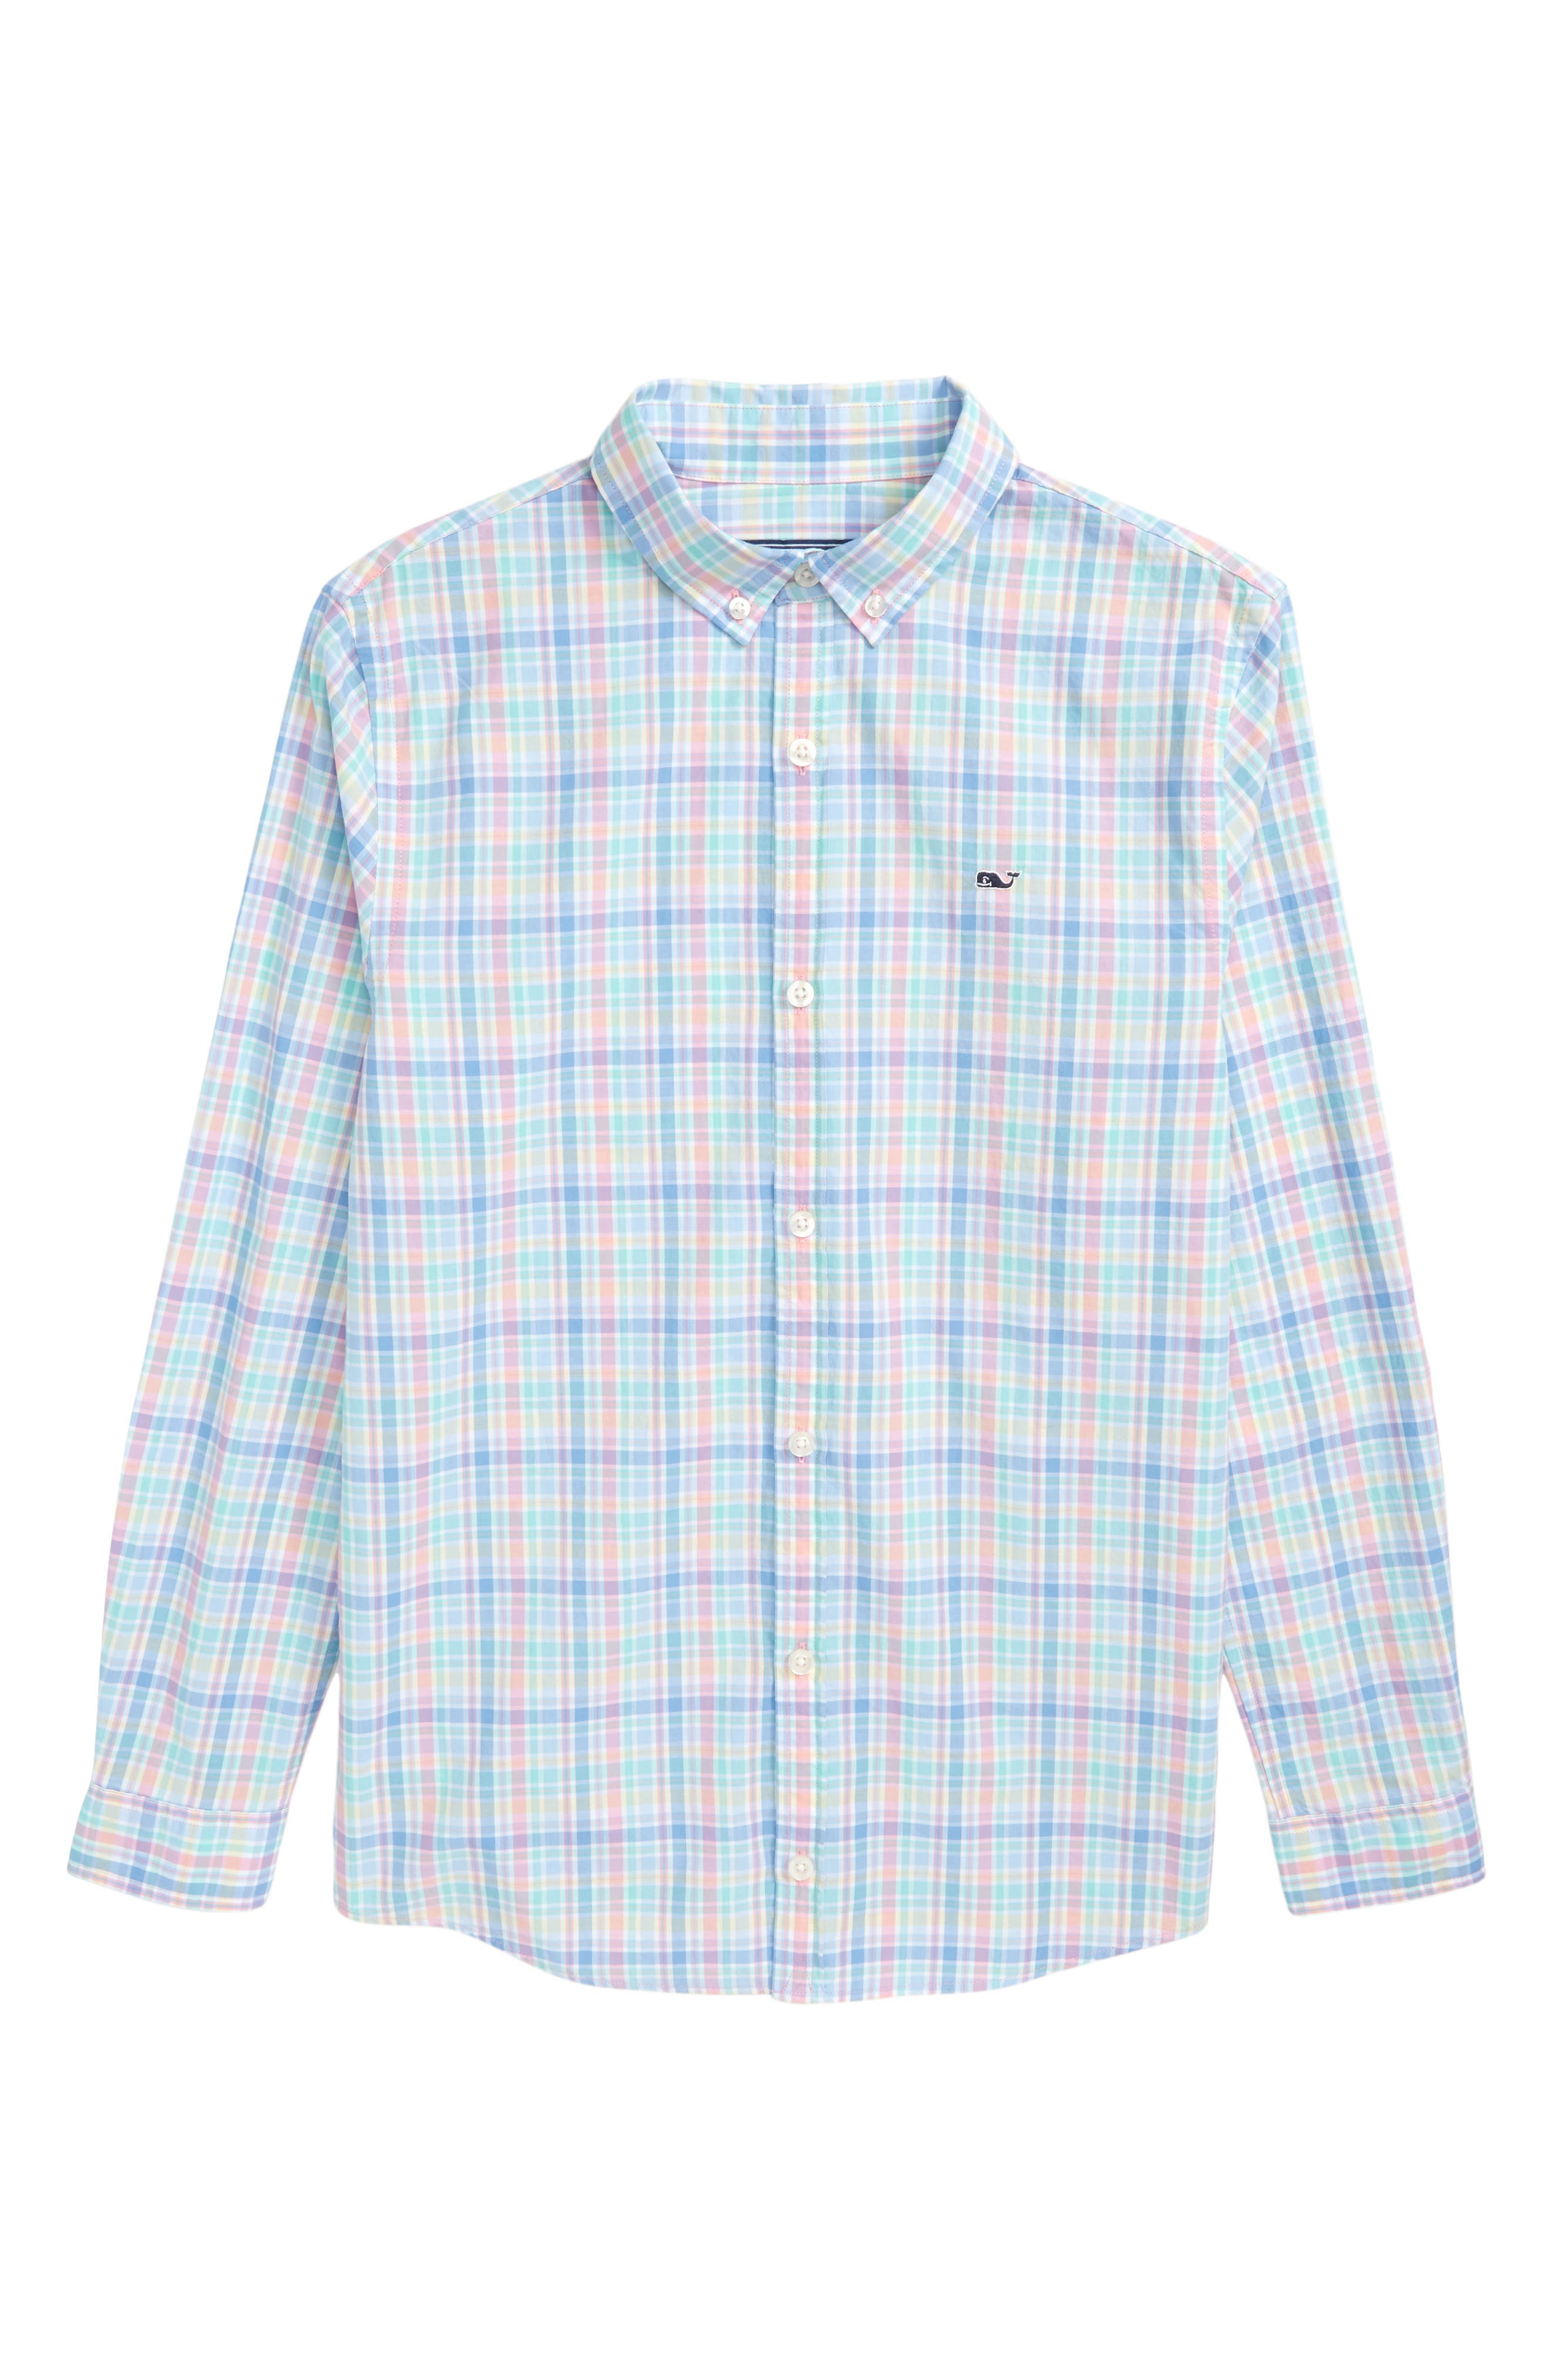 Walkers Cay Plaid Woven Shirt,                         Main,                         color, Jake Blue